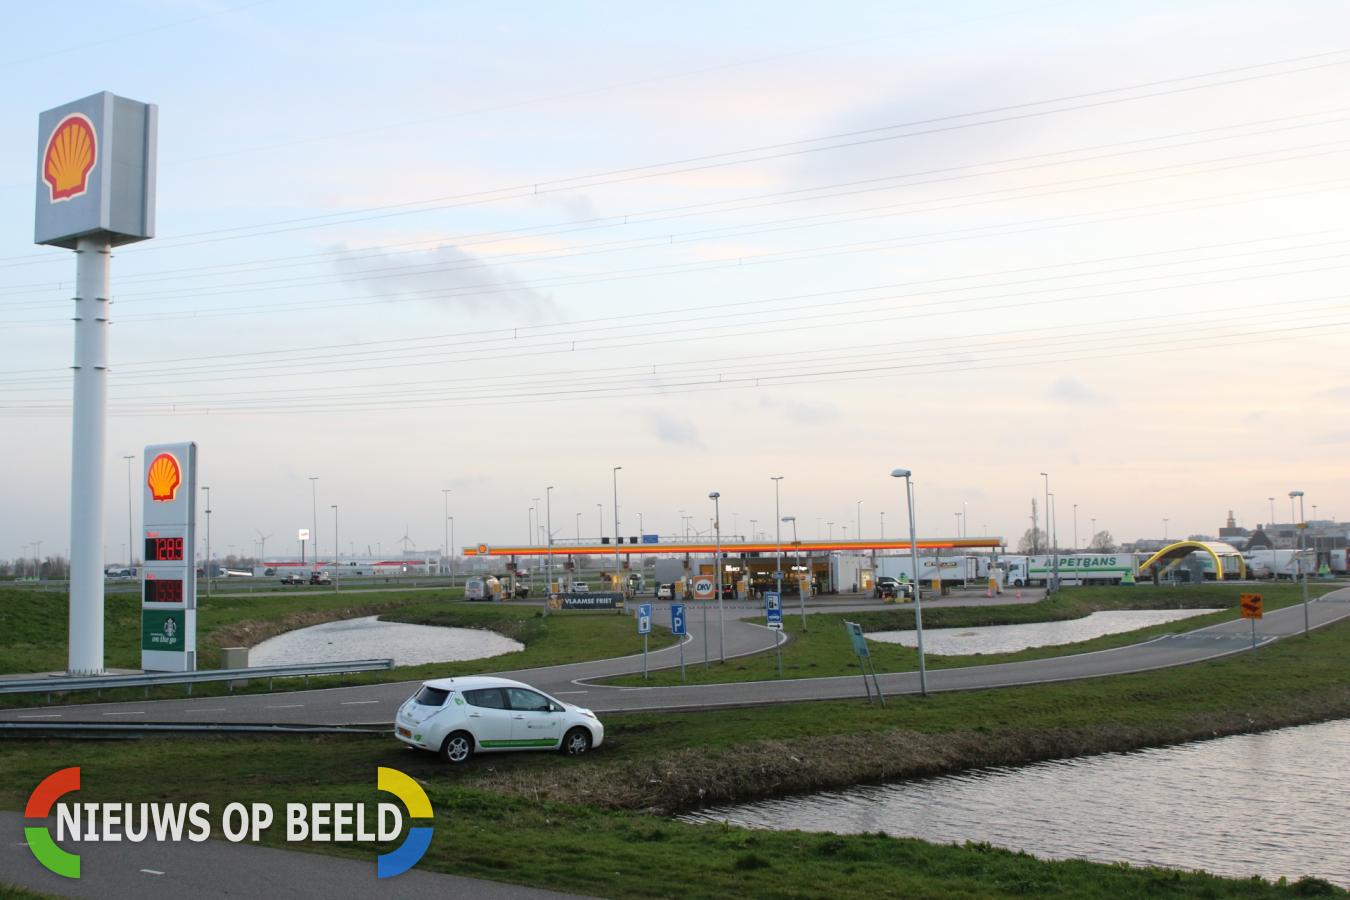 Bestuurder personenauto word gestraft voor rijden over fietspad Rijksweg A4 Leiderdorp